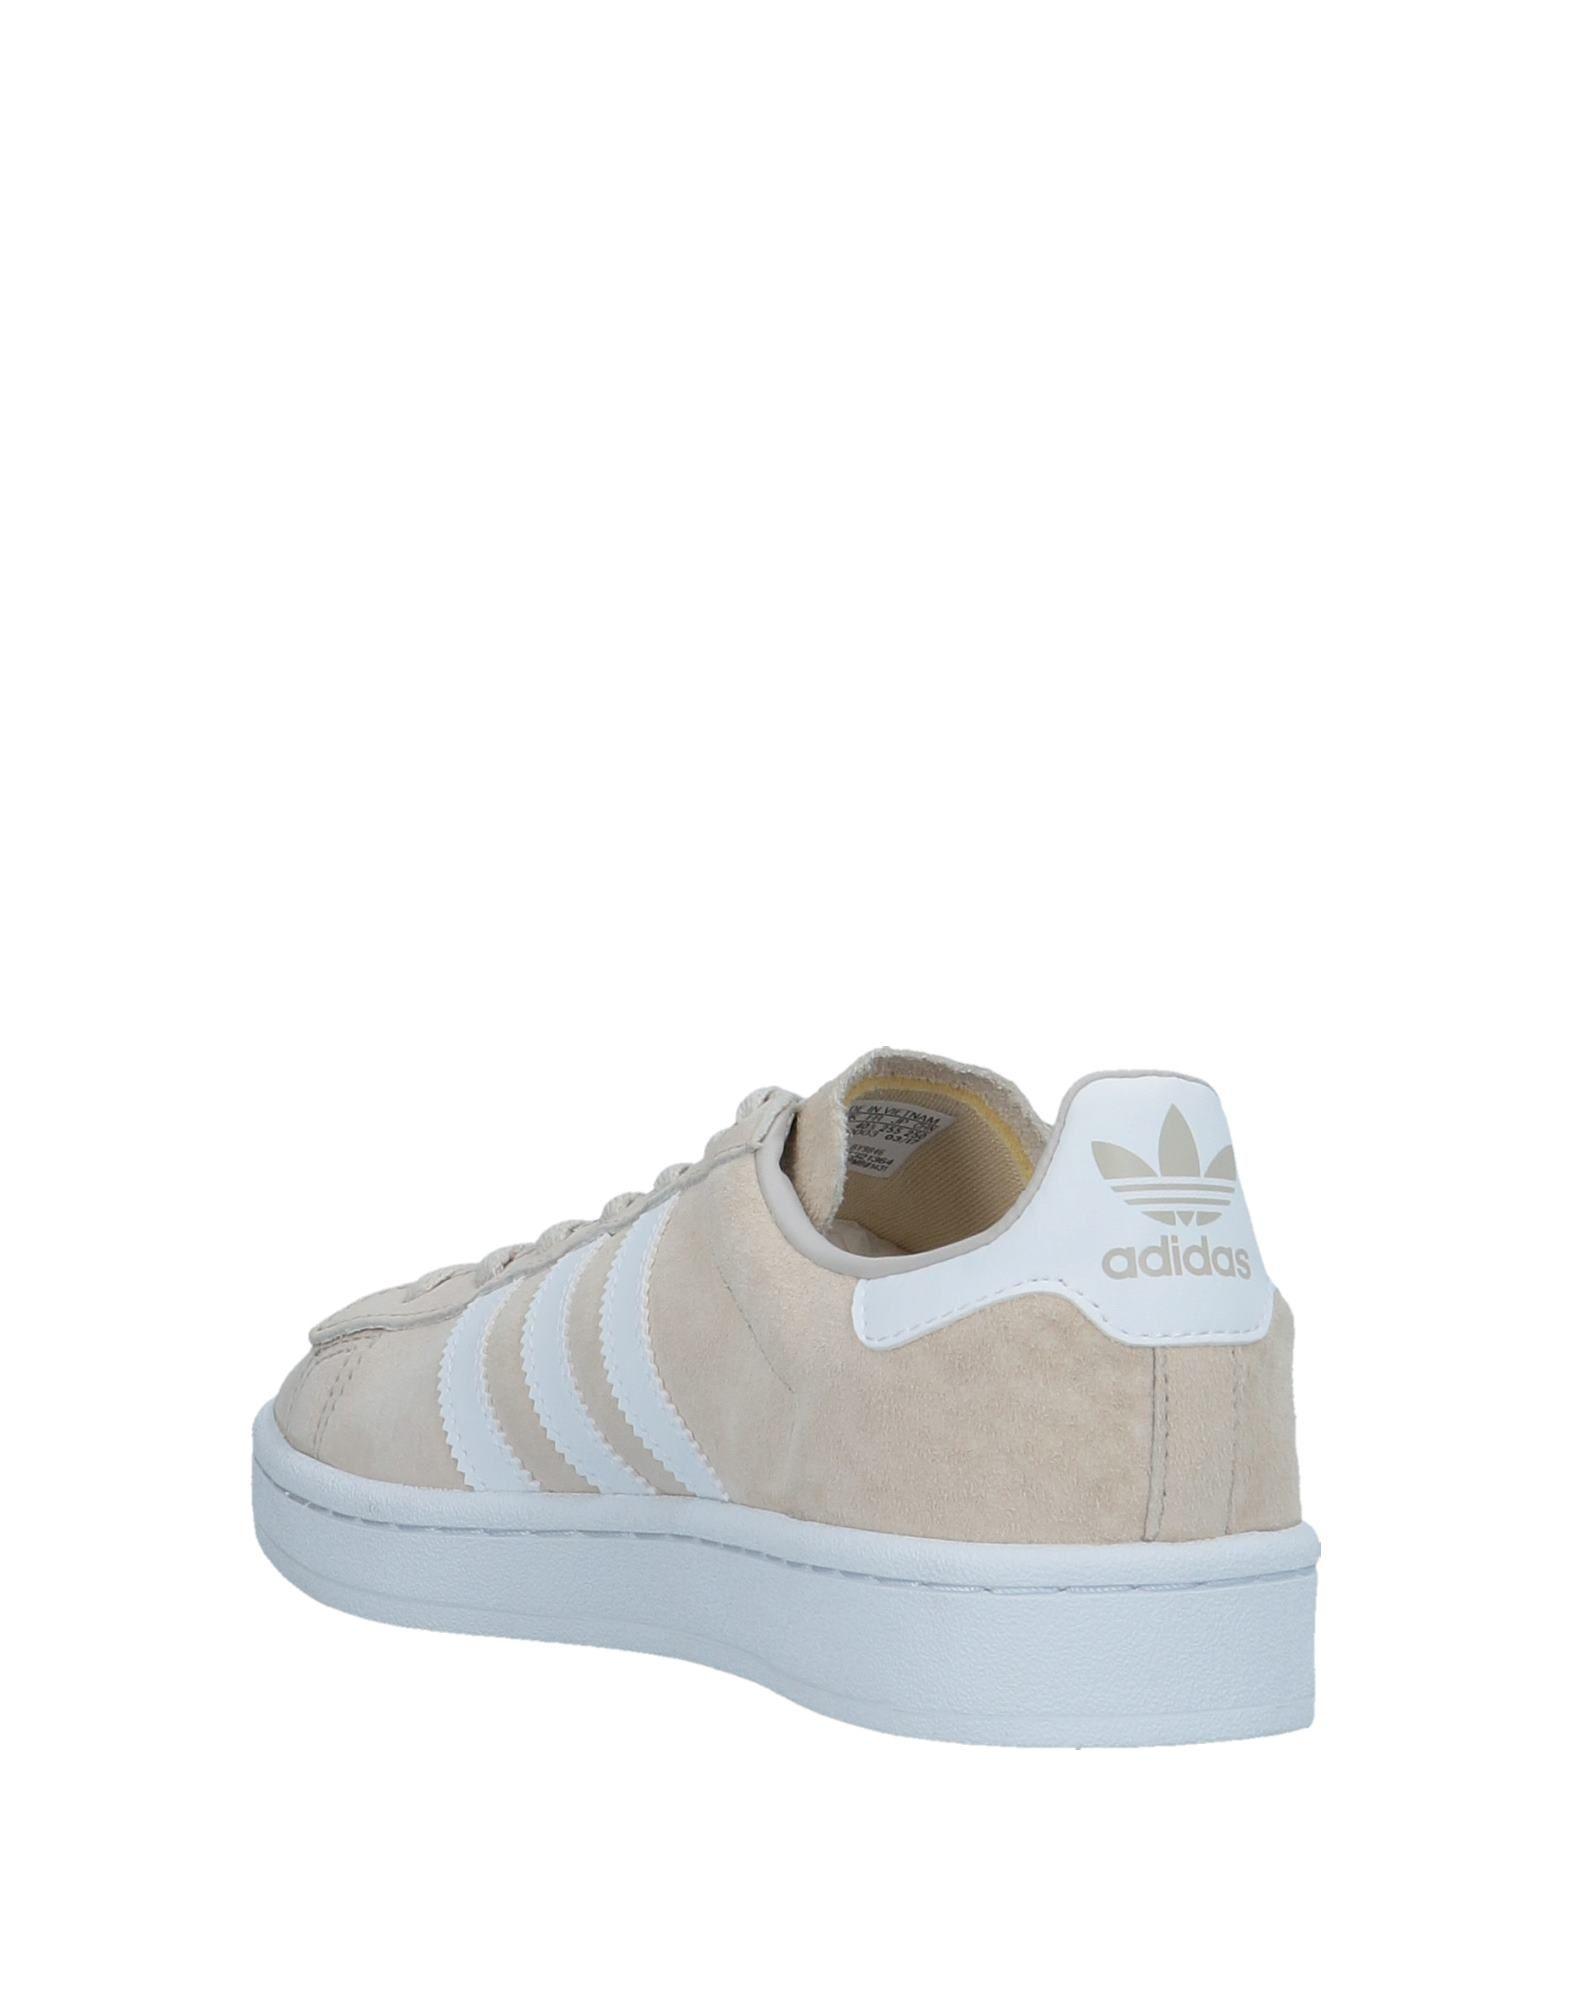 Adidas Sneakers Damen Damen Sneakers  11537384DE  cc19ed